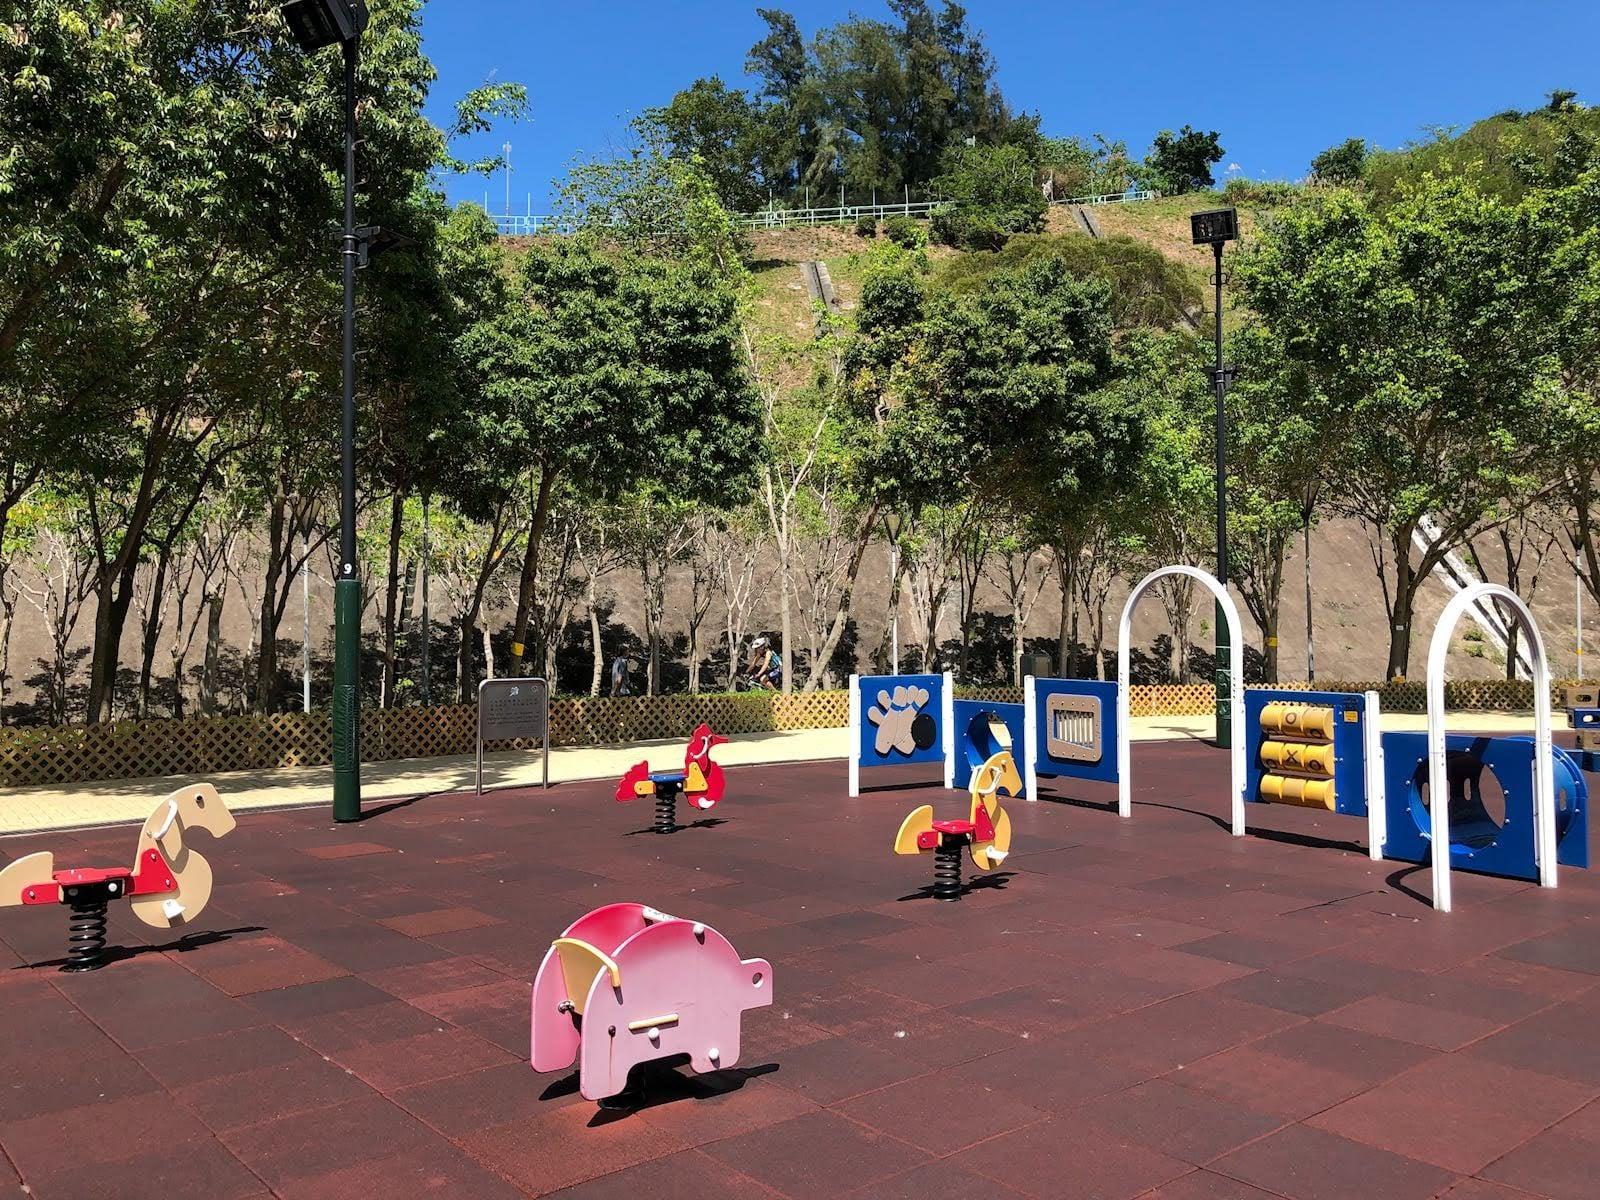 Siu Sai Wan Promenade's spring riders at playground